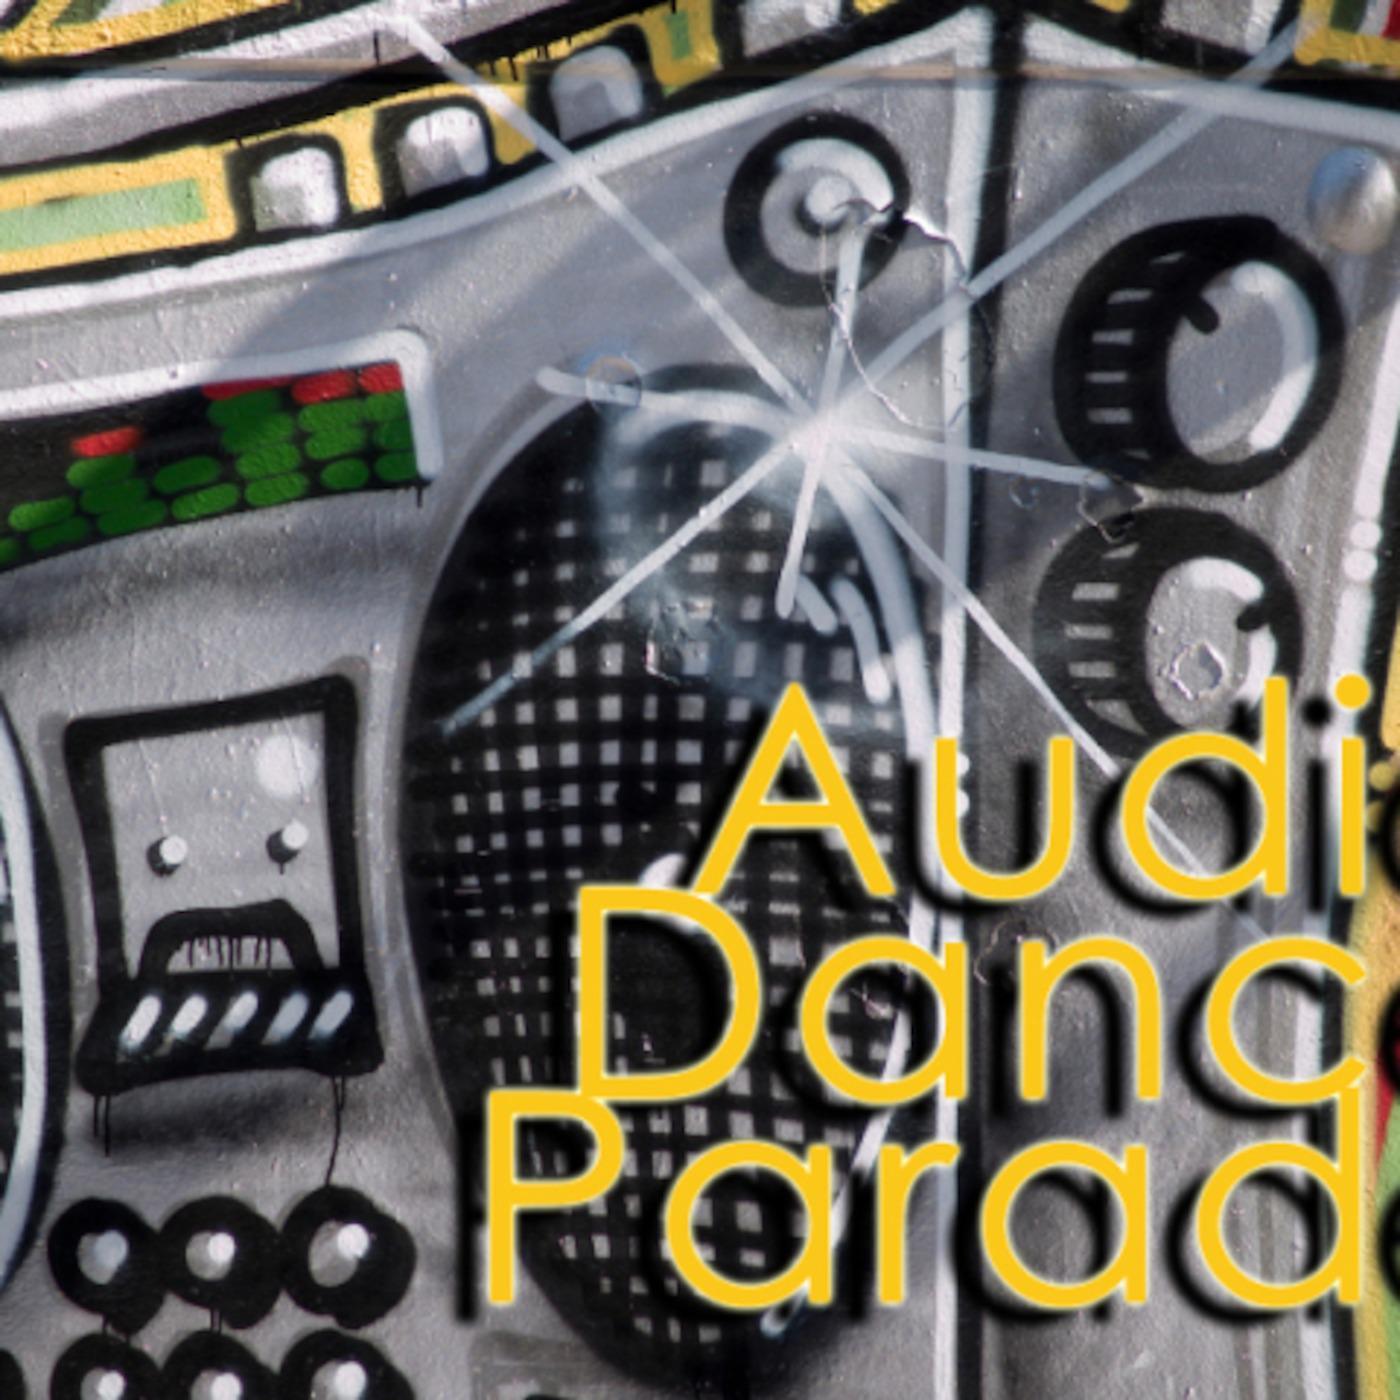 AUDIO DANCE PARADE (podcast) - Audio Dance Parade | Listen Notes